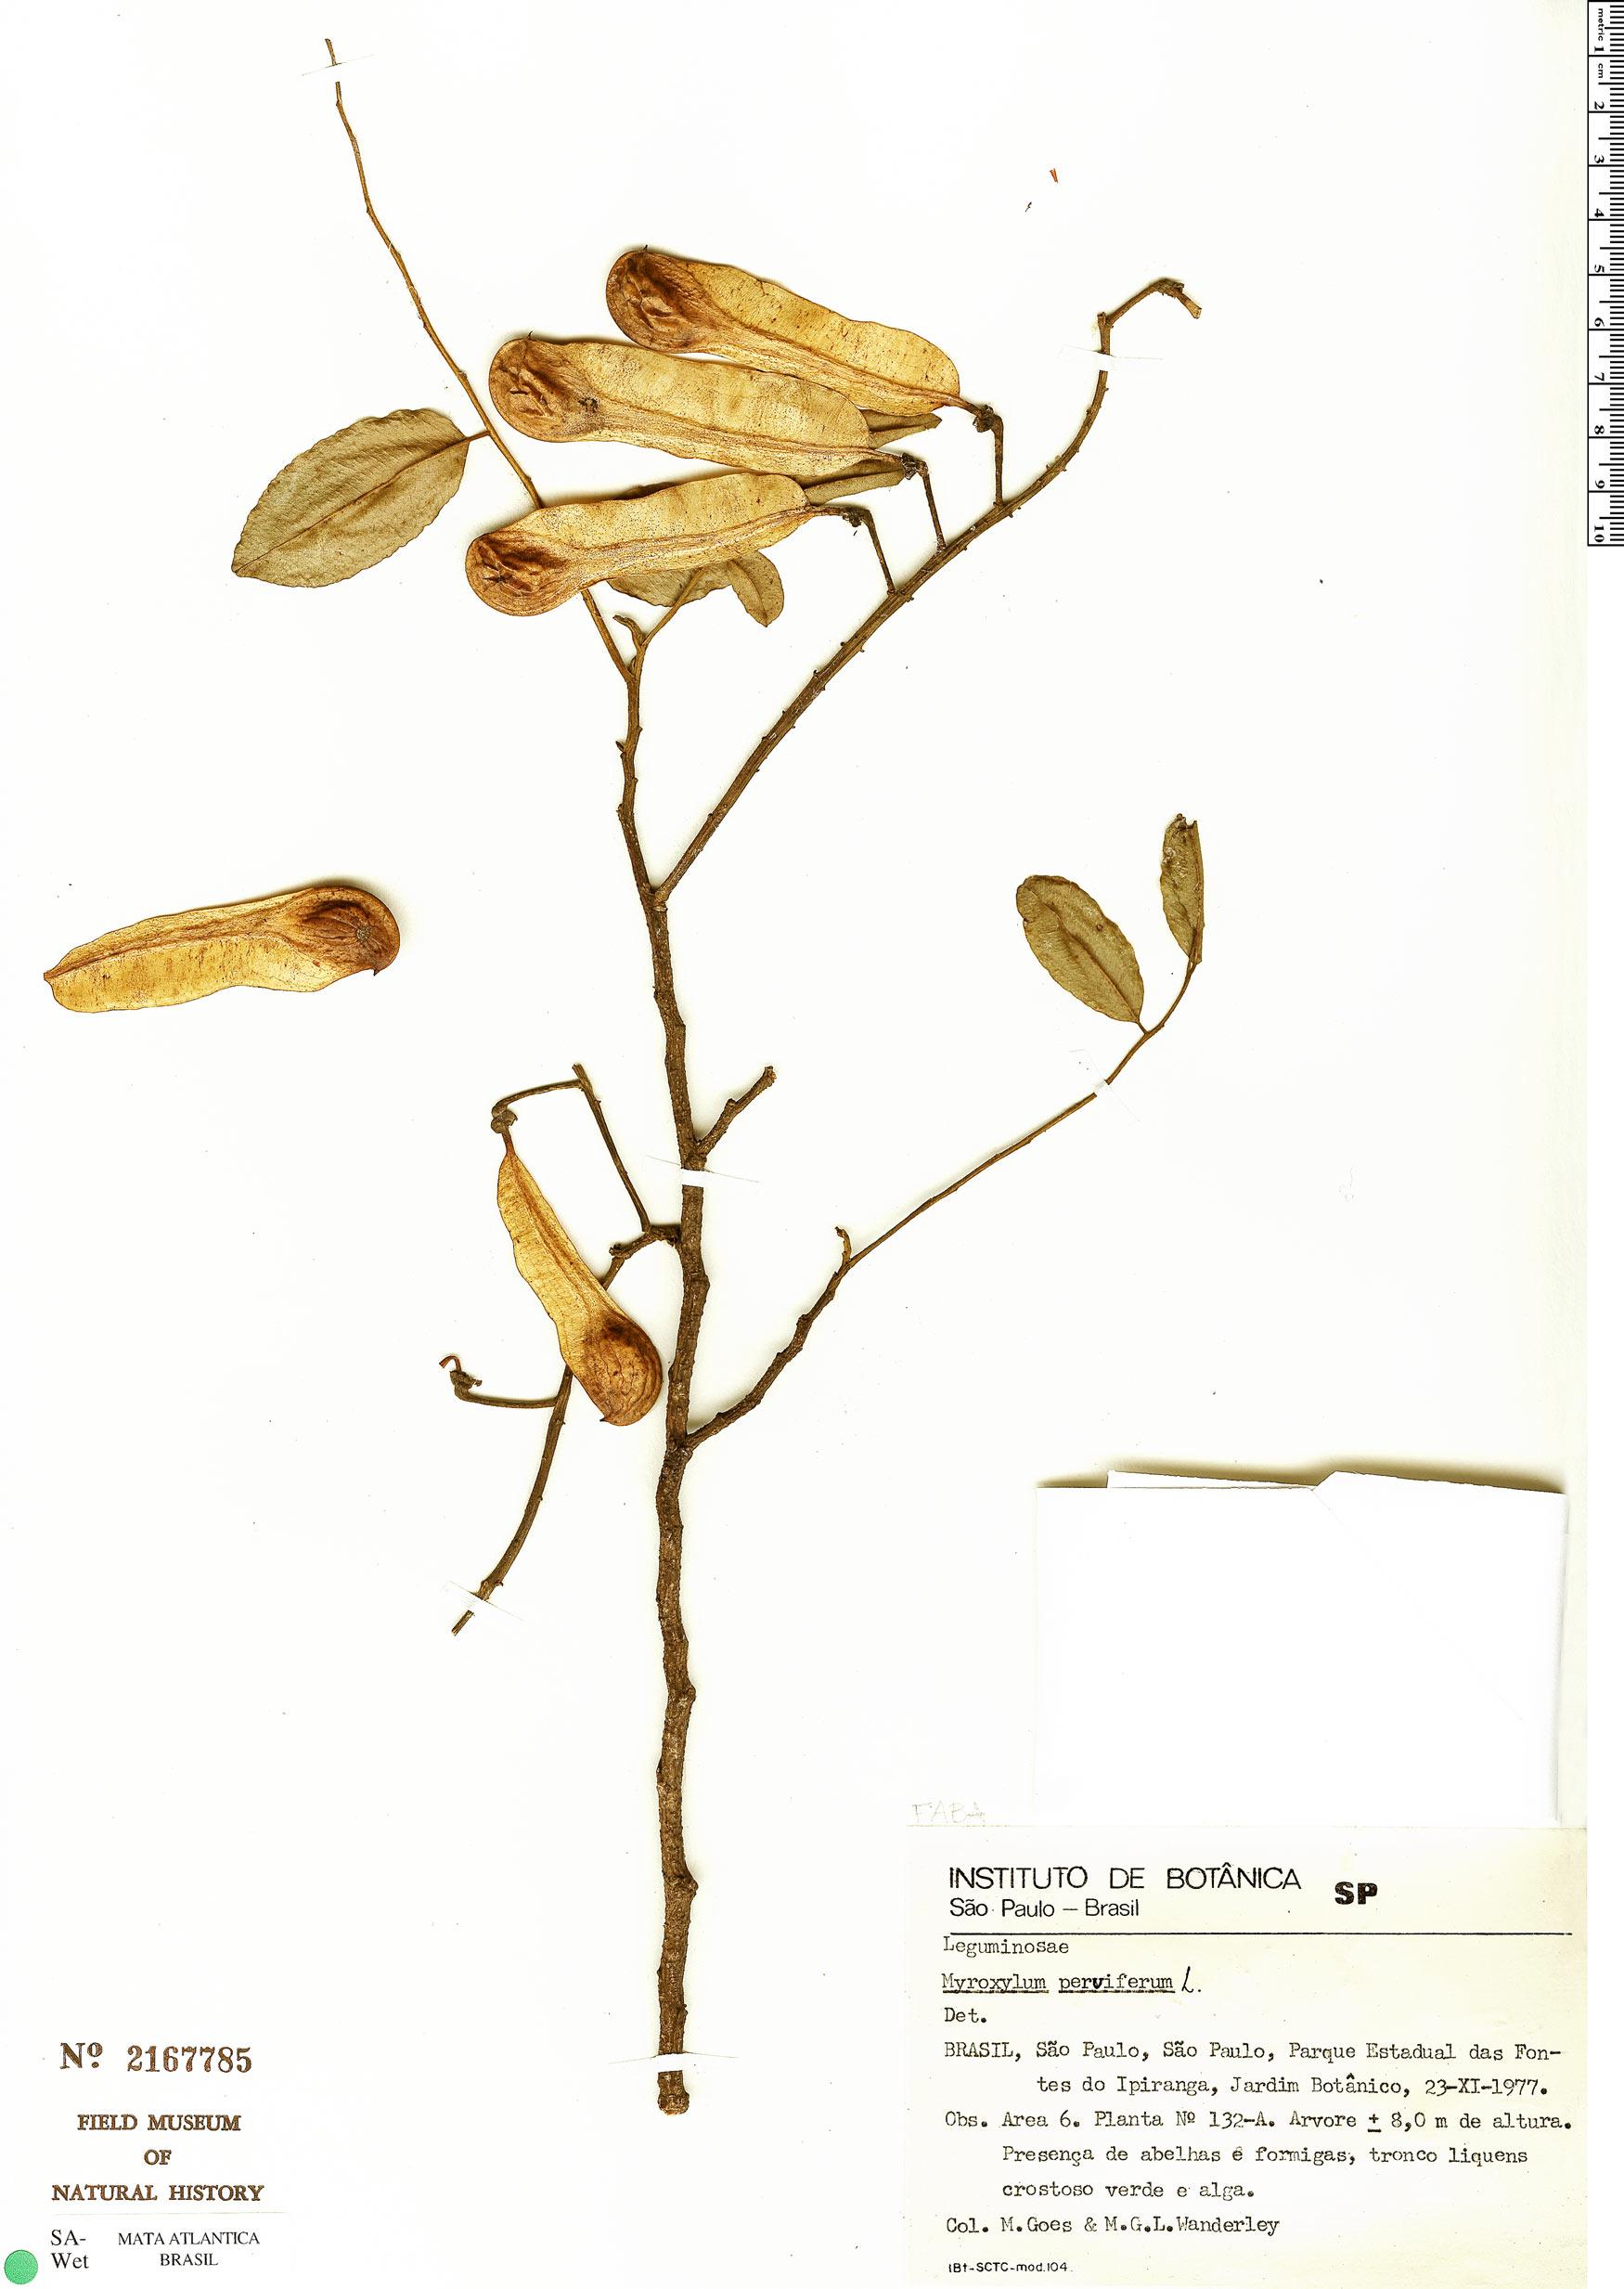 Specimen: Myroxylon peruiferum